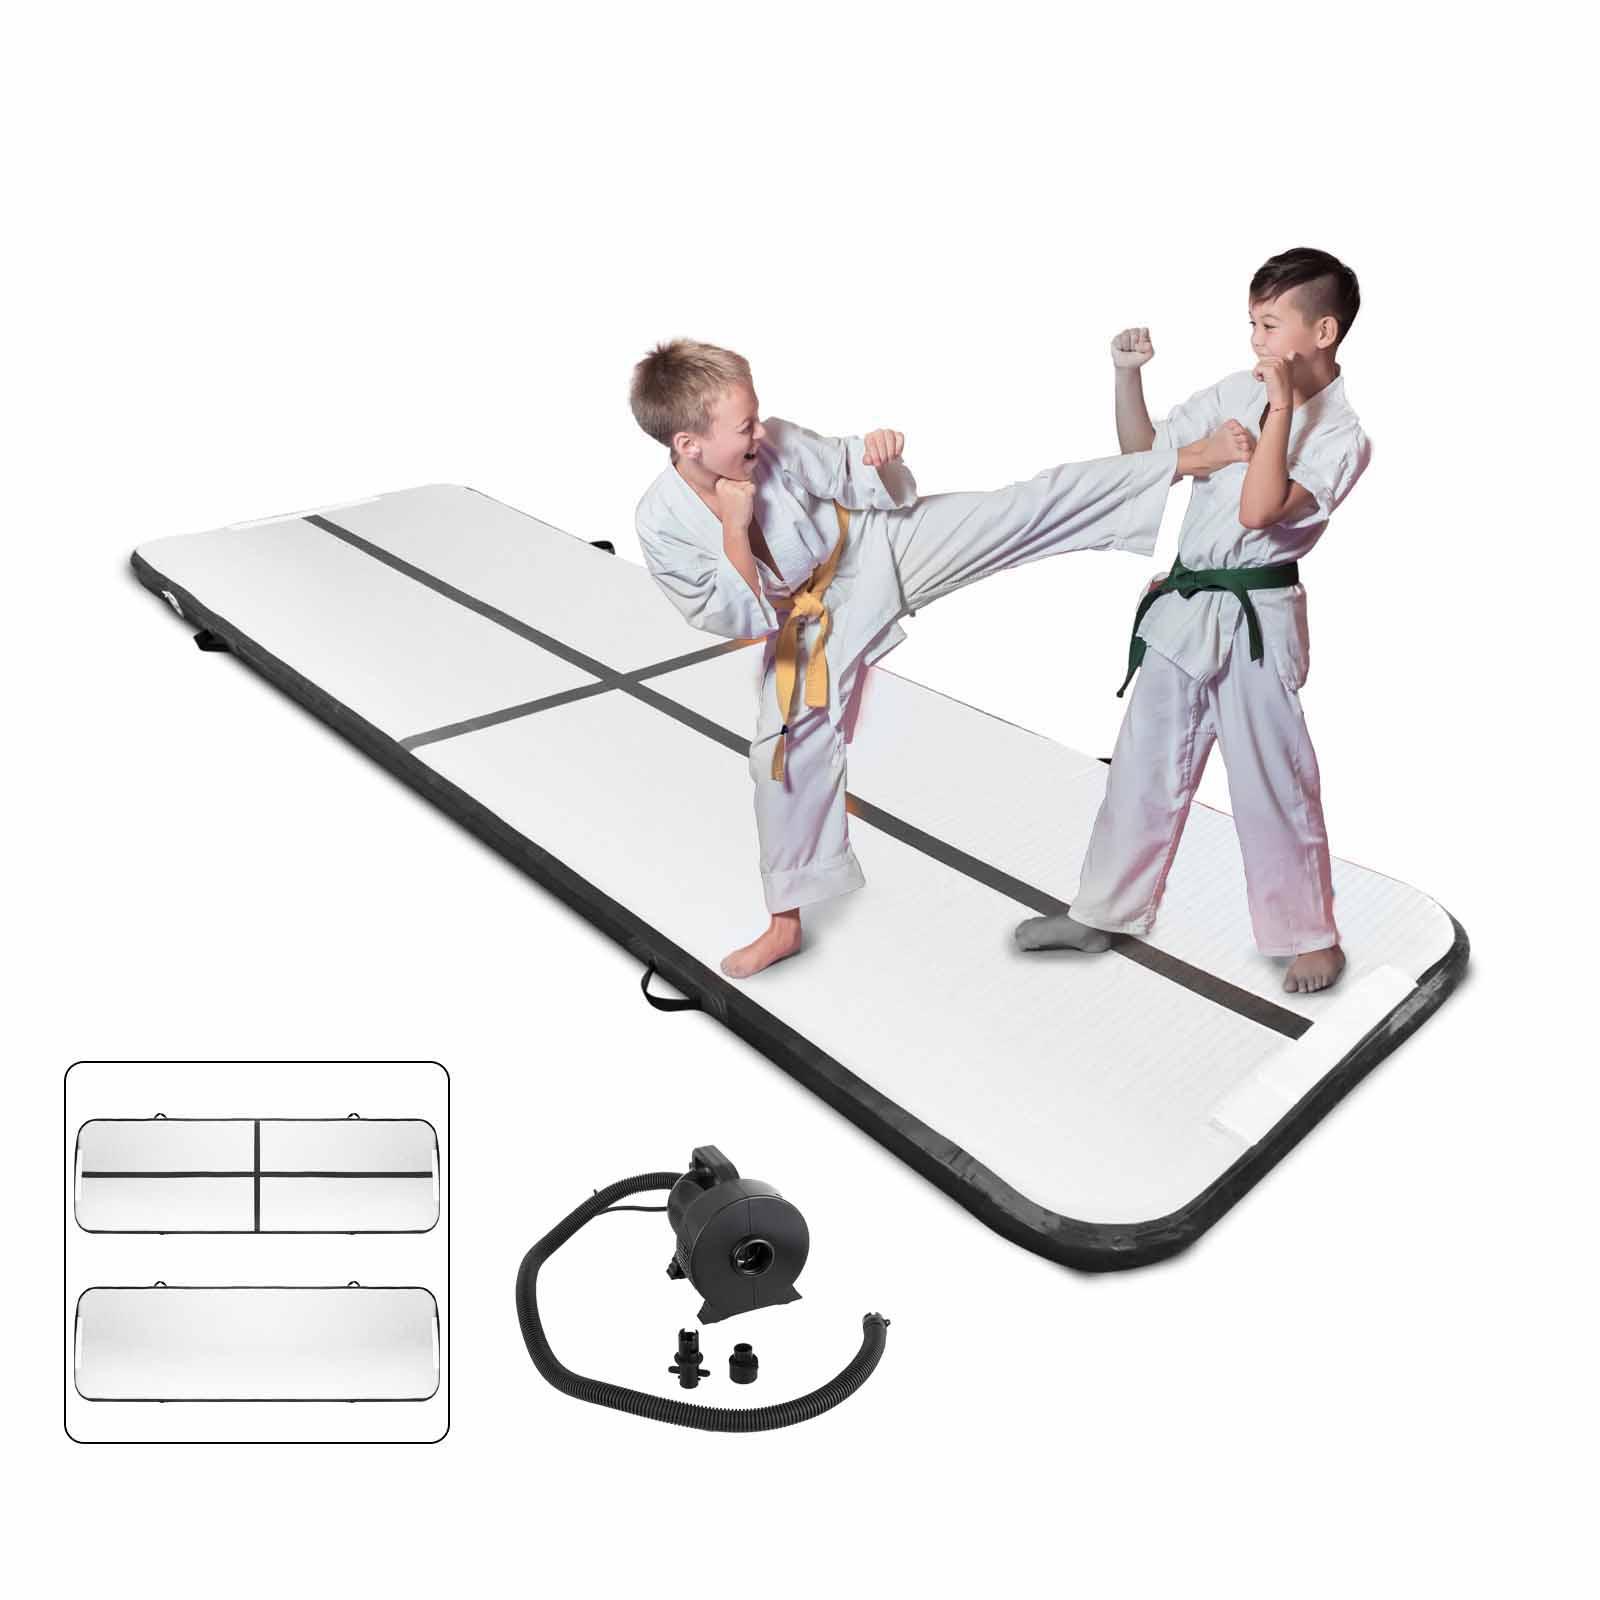 Air-Track-10x3FT-Trumbling-Airtrack-Gymnastics-Yoga-Floor-Mat-Training-Pad-Home thumbnail 120